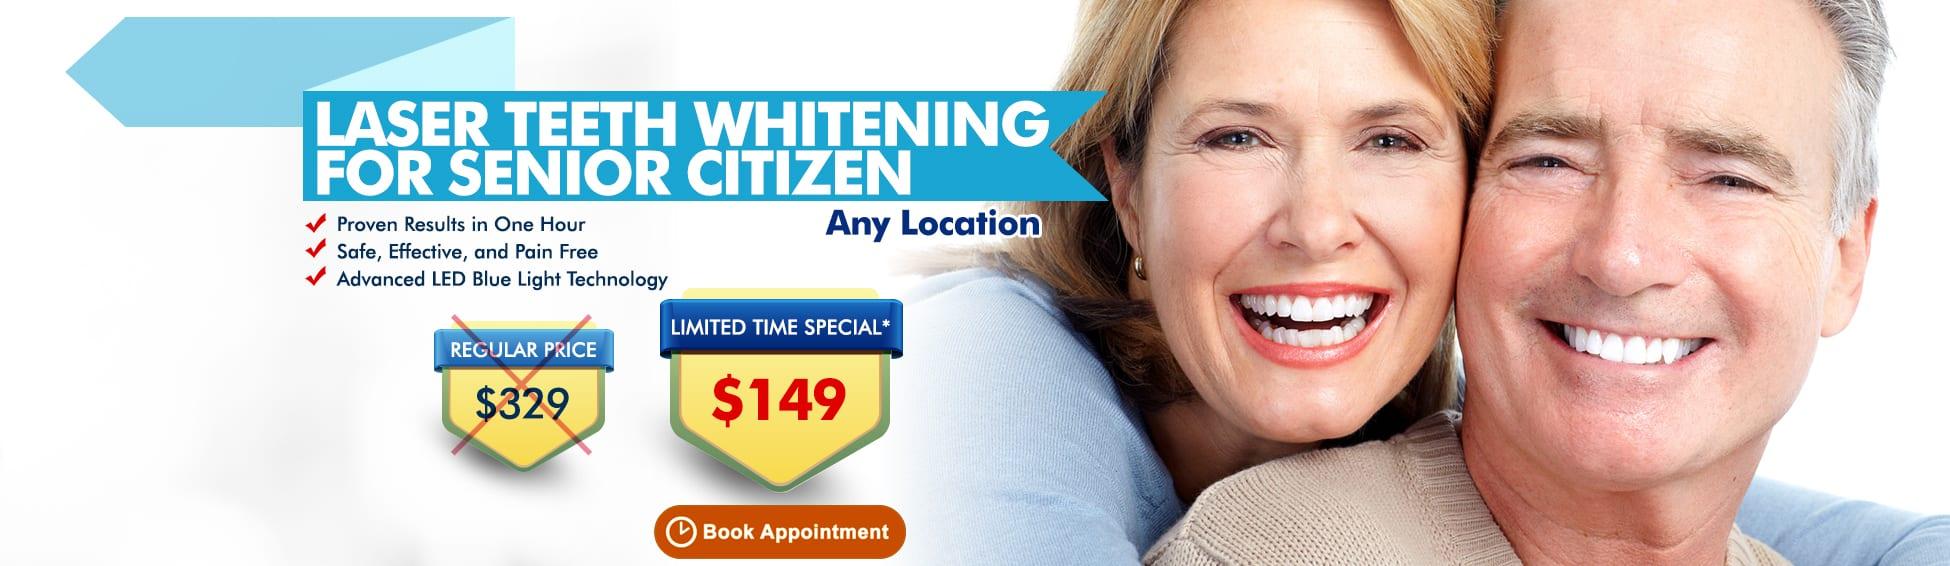 Laser Teeth Whitening For Senior Citizen – Any Location - $199 $149